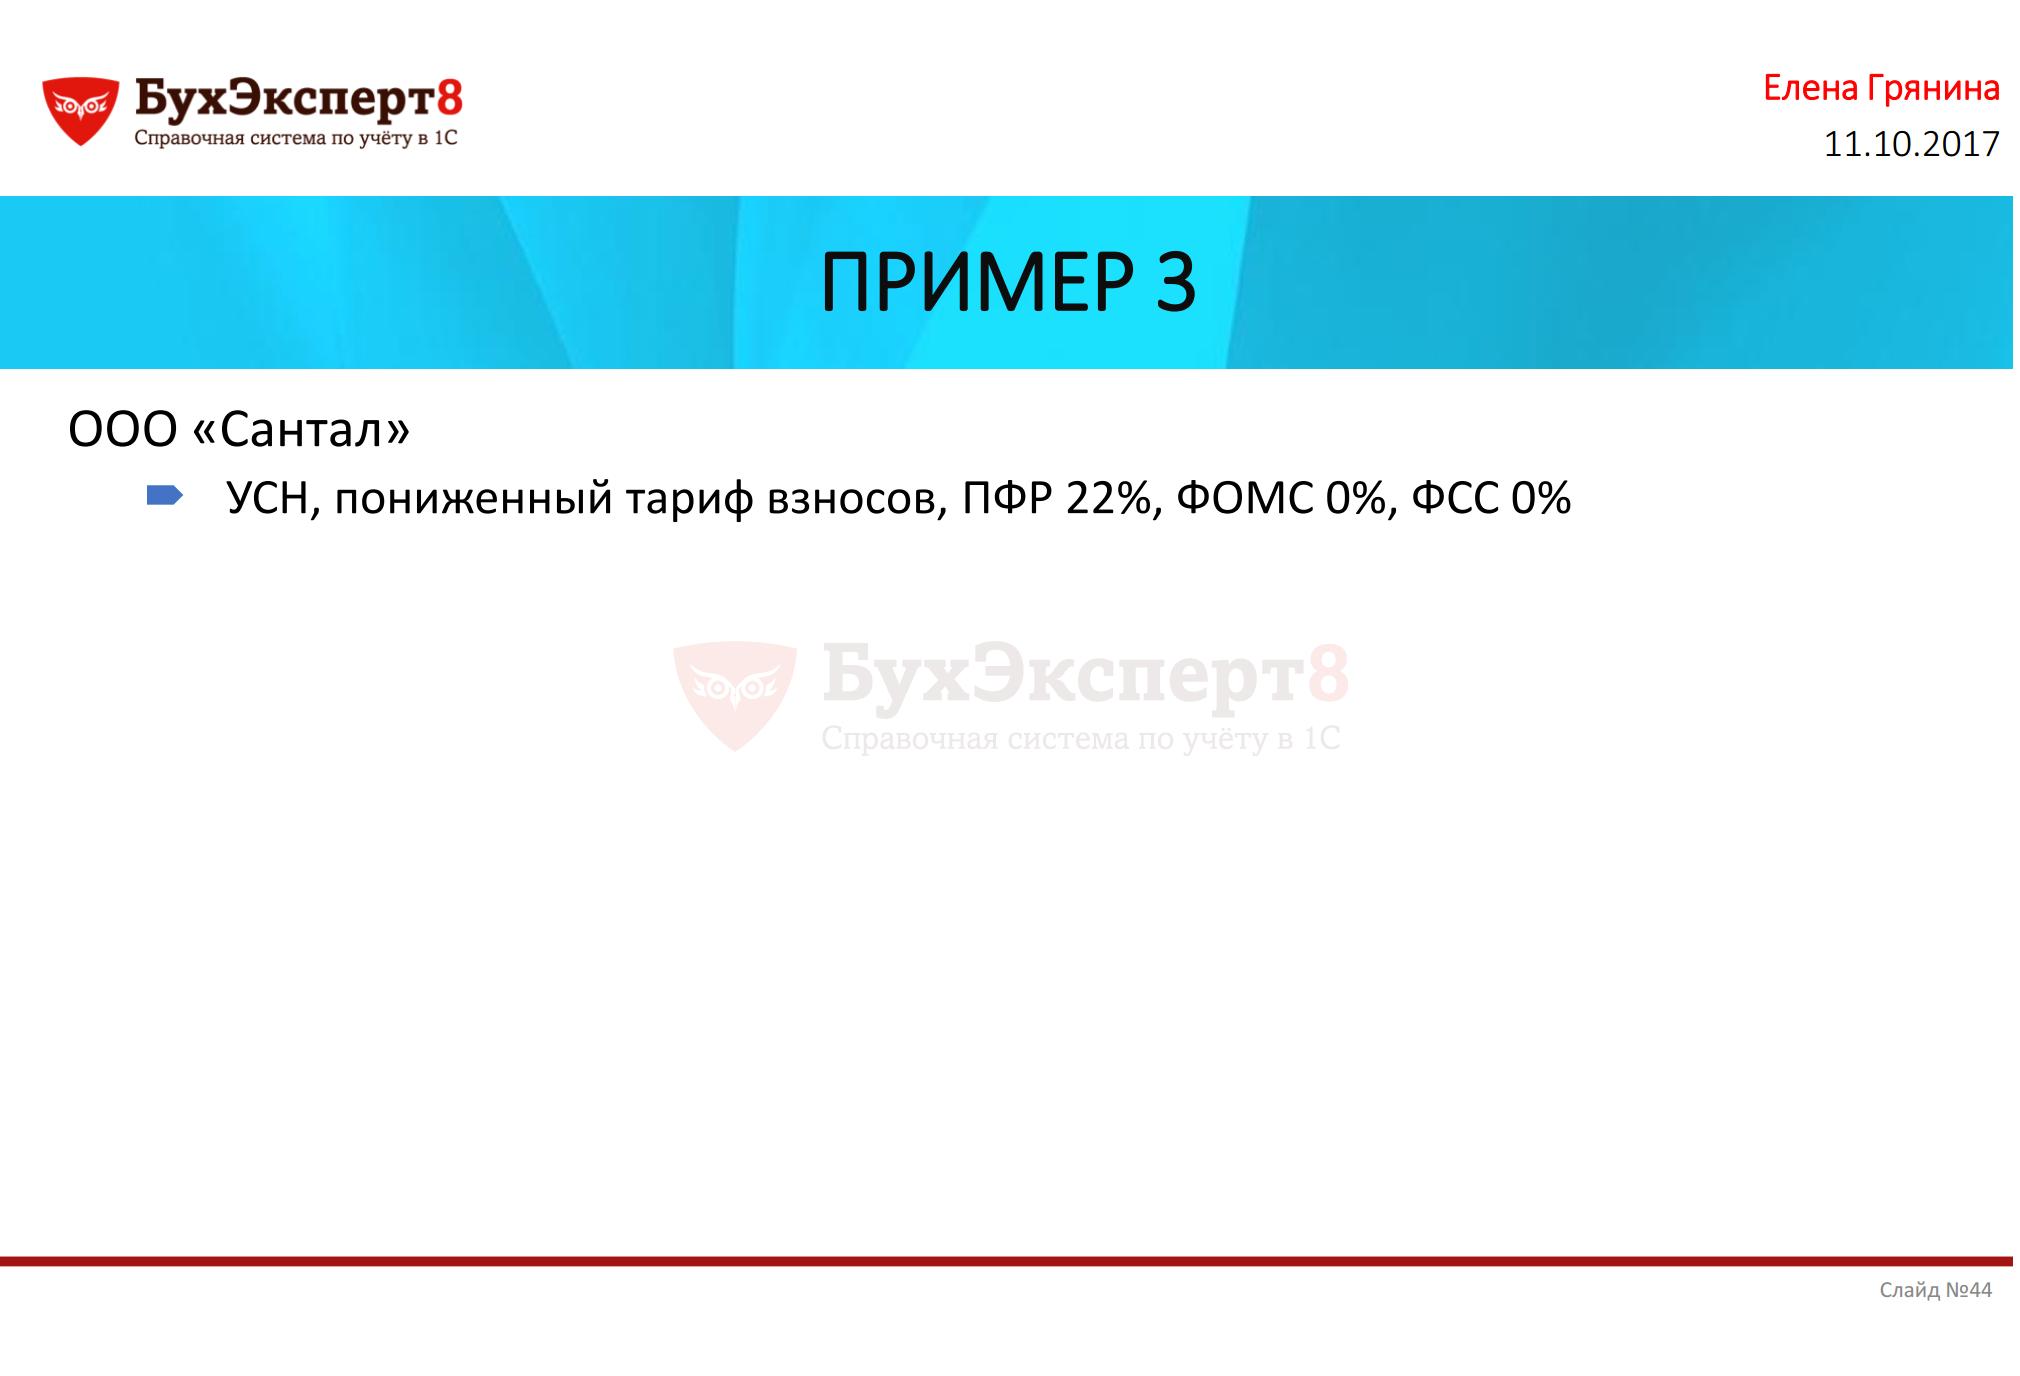 ПРИМЕР 3 ООО «Сантал» УСН, пониженный тариф взносов, ПФР 22%, ФОМС 0%, ФСС 0%